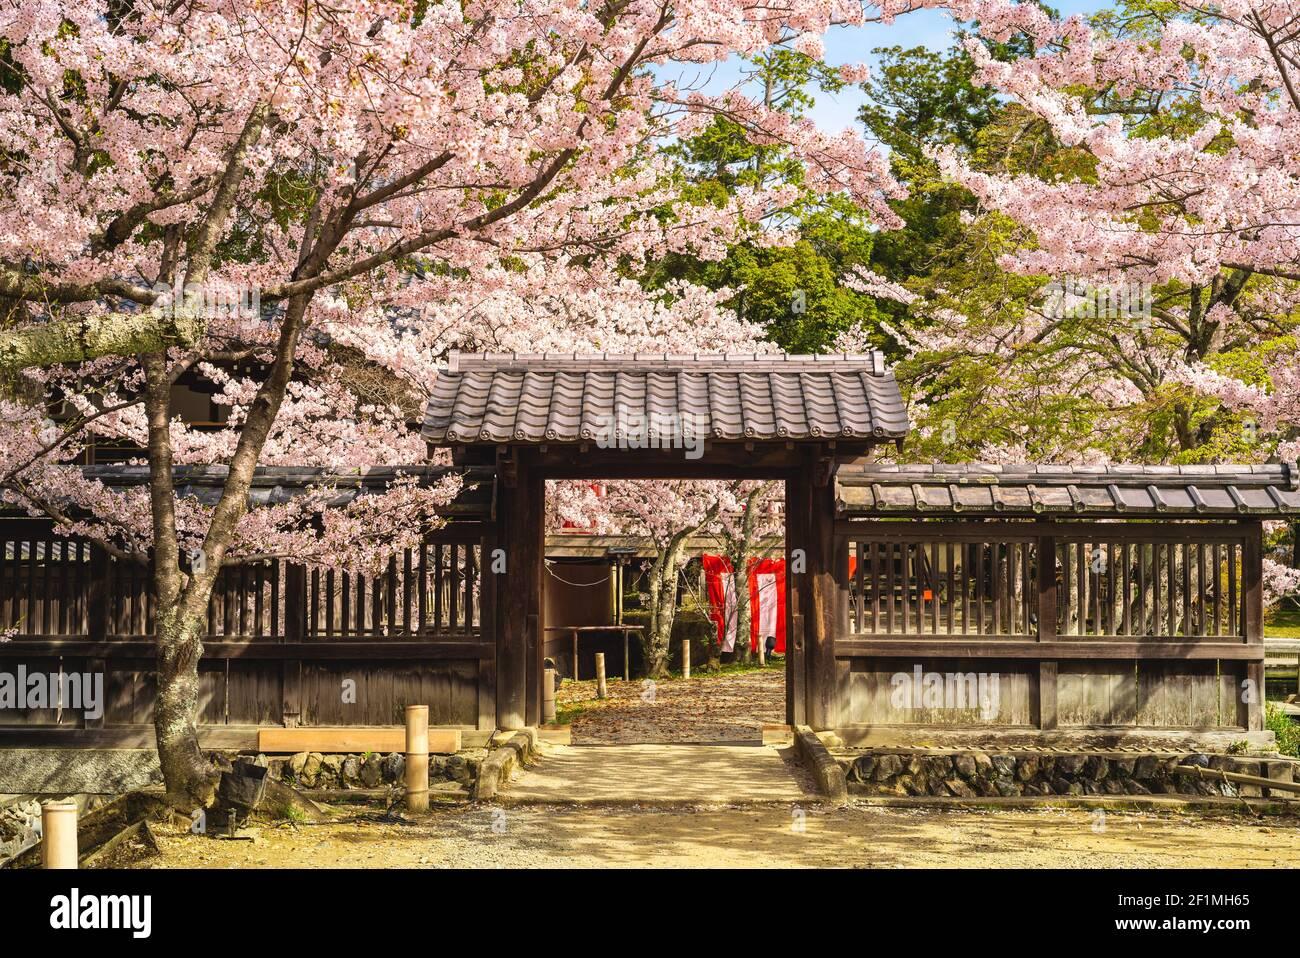 Daikaku ji Temple with cherry blossom at arashiyama, kyoto, kansai, japan Stock Photo